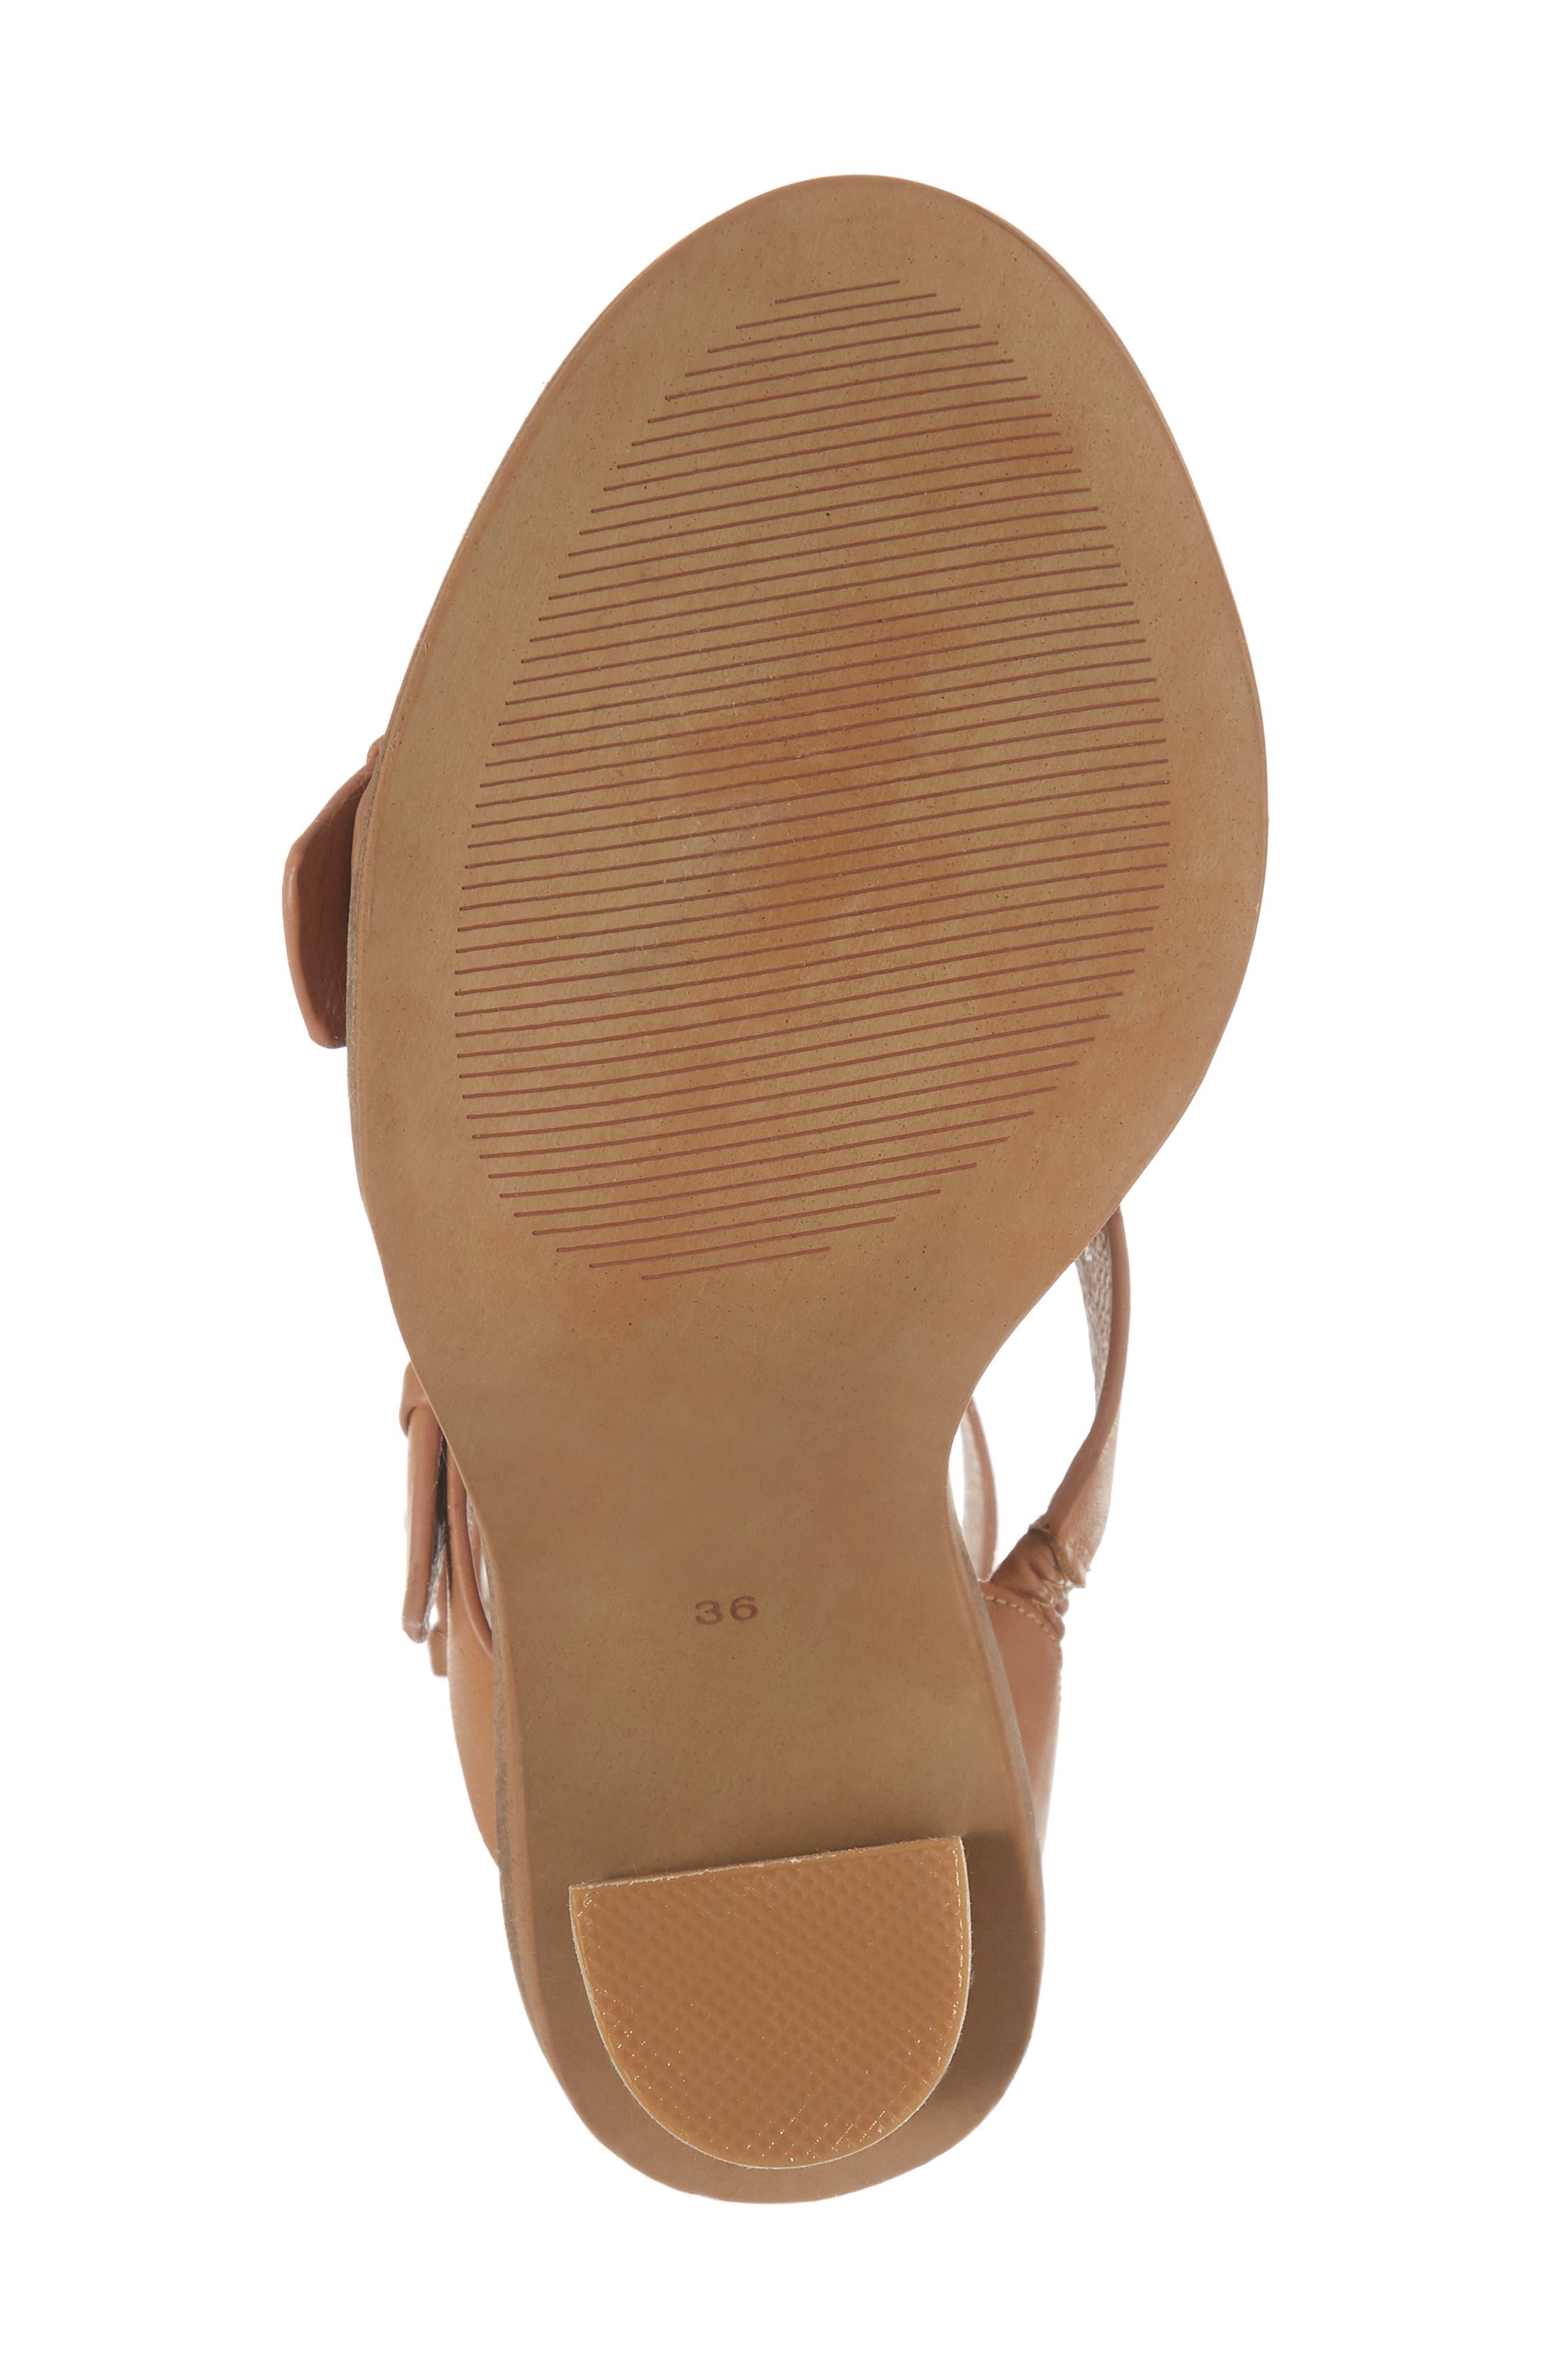 Adore Tall Cuffed Sandal,                             Alternate thumbnail 6, color,                             Light Tan Leather